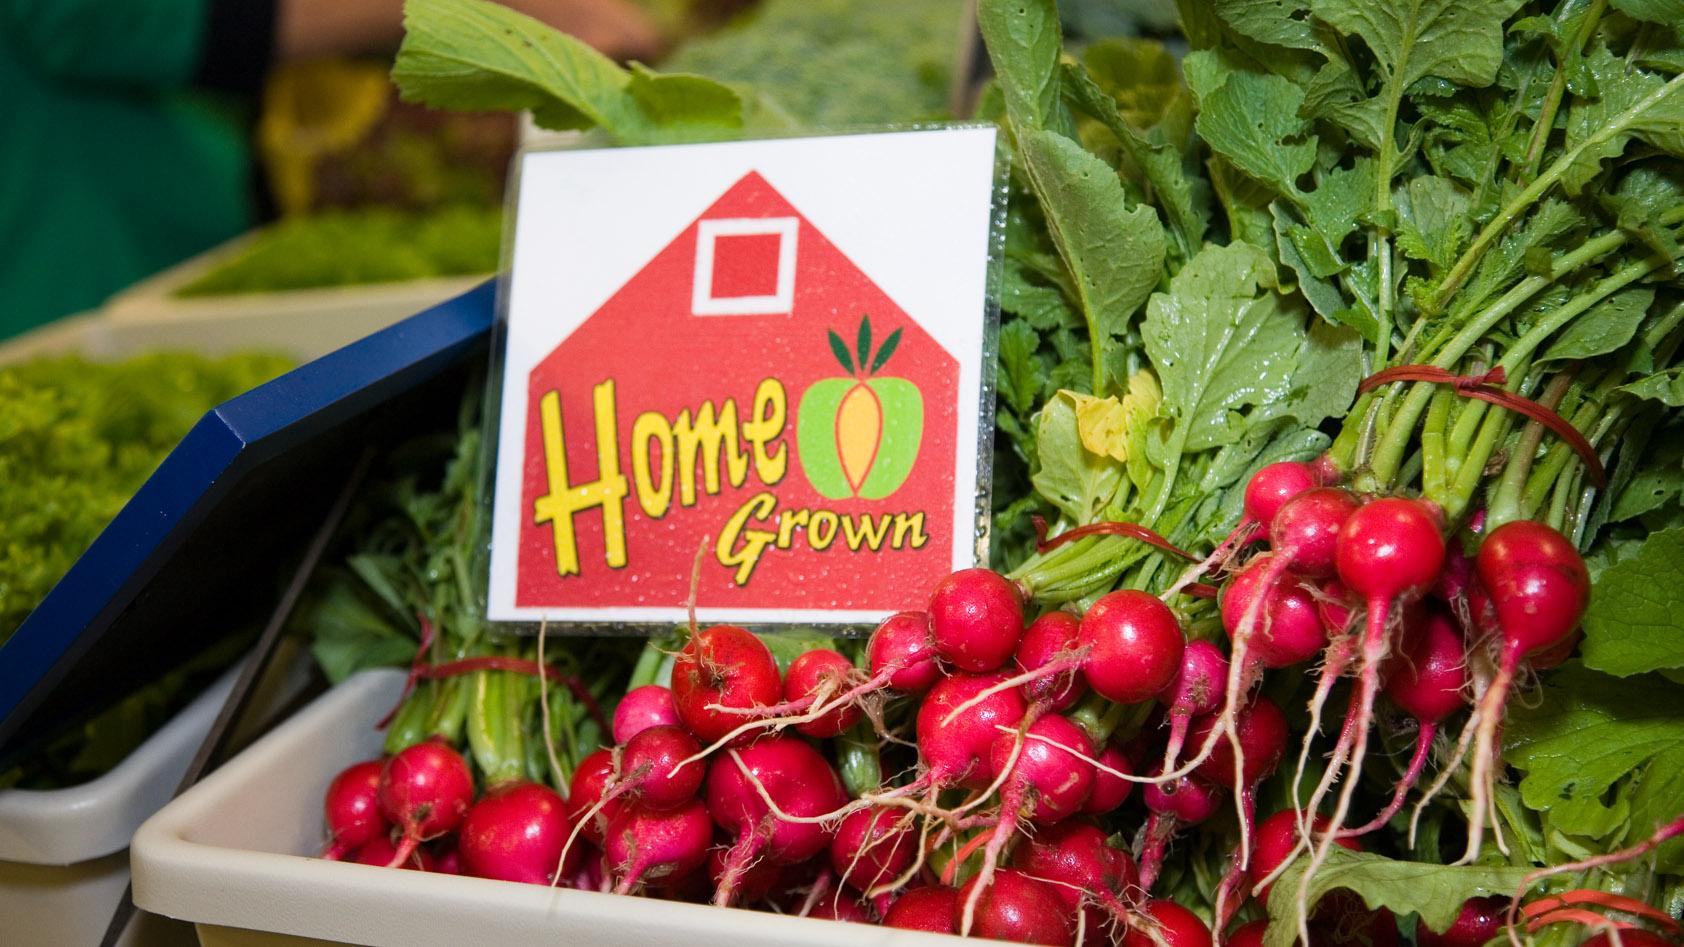 Farm produce, Flint Farmers' Market, Flint, Mi